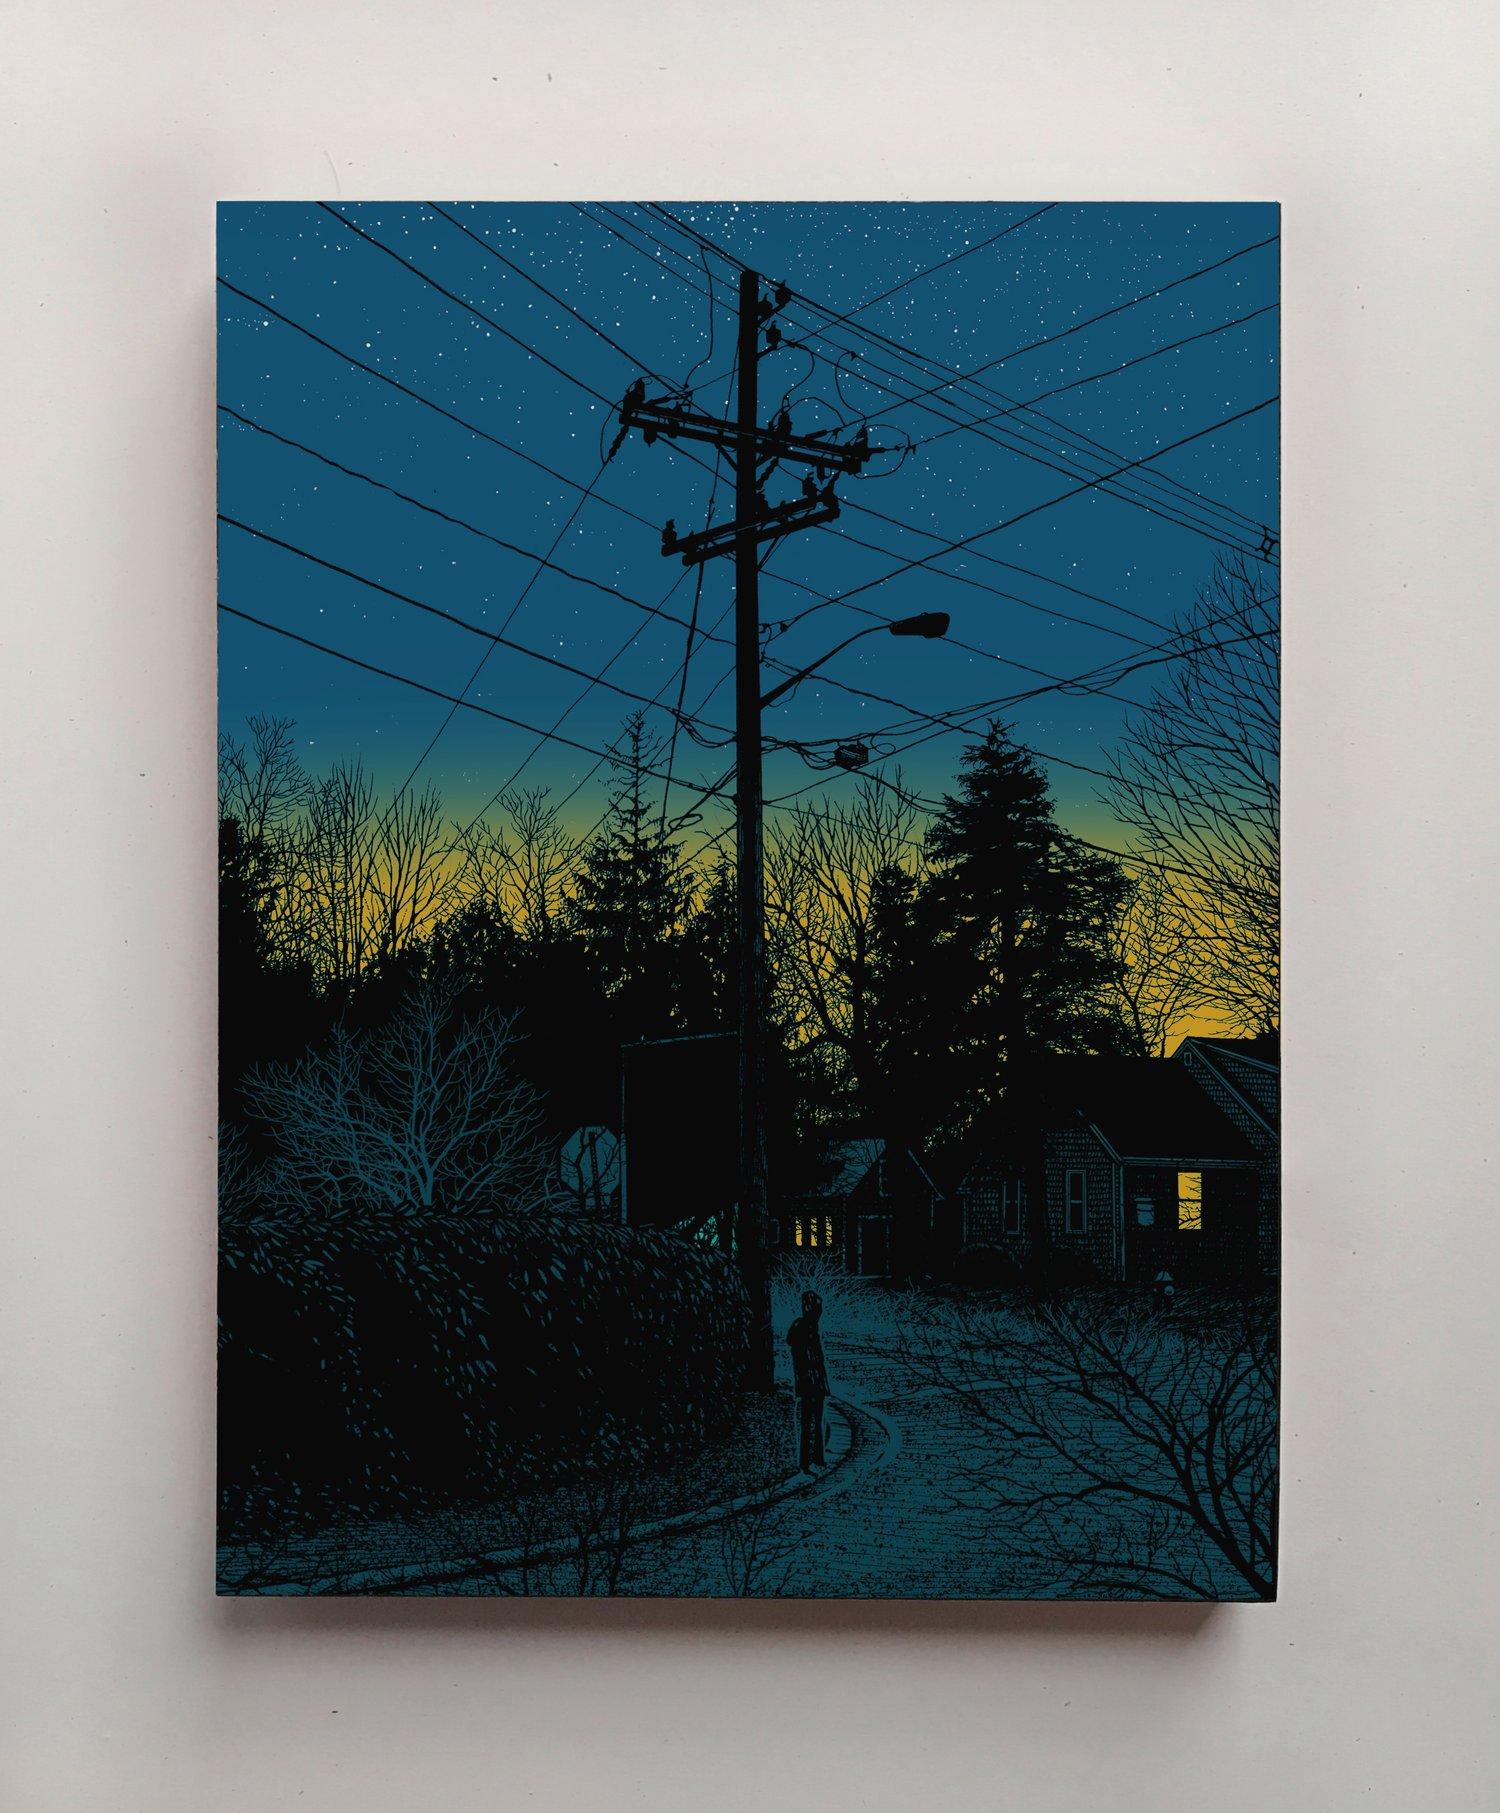 "Image of ""BREADCRUMB TRAIL #002 - 41˚37'31"" N 70˚23""12"" W"" - ORANGE VARIANT"